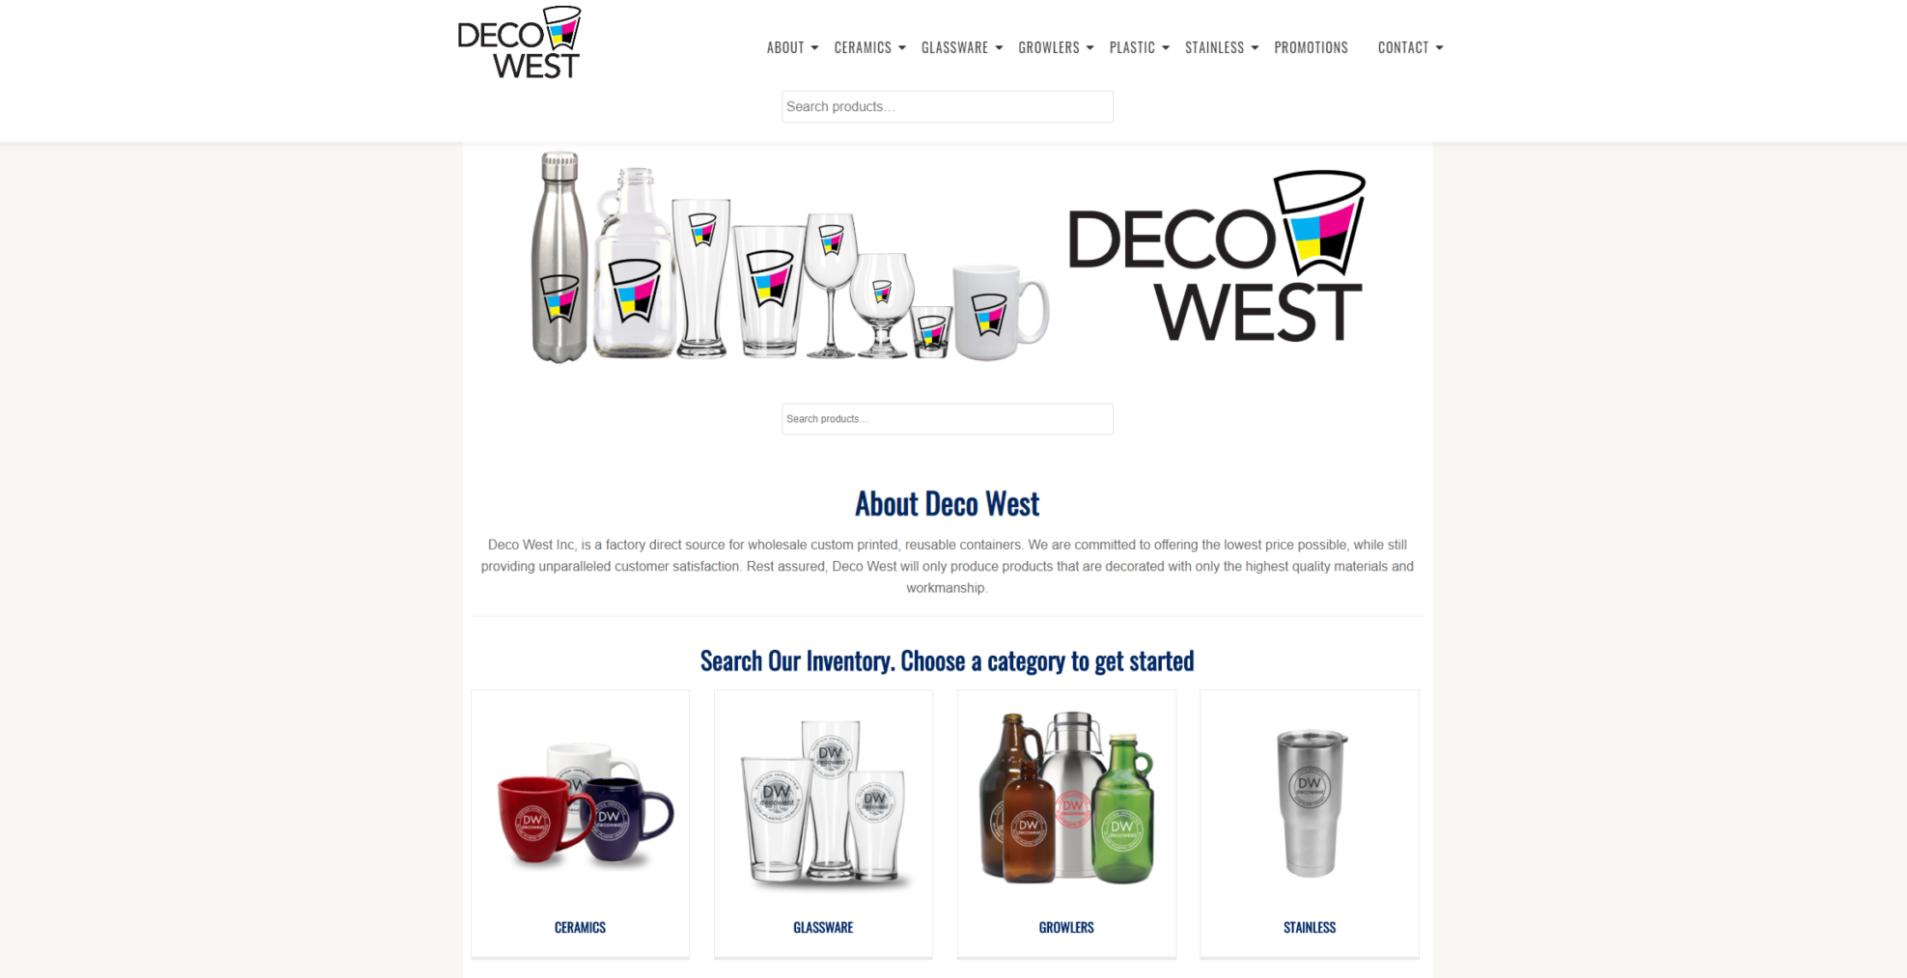 Decowest website designed by 702 Pros